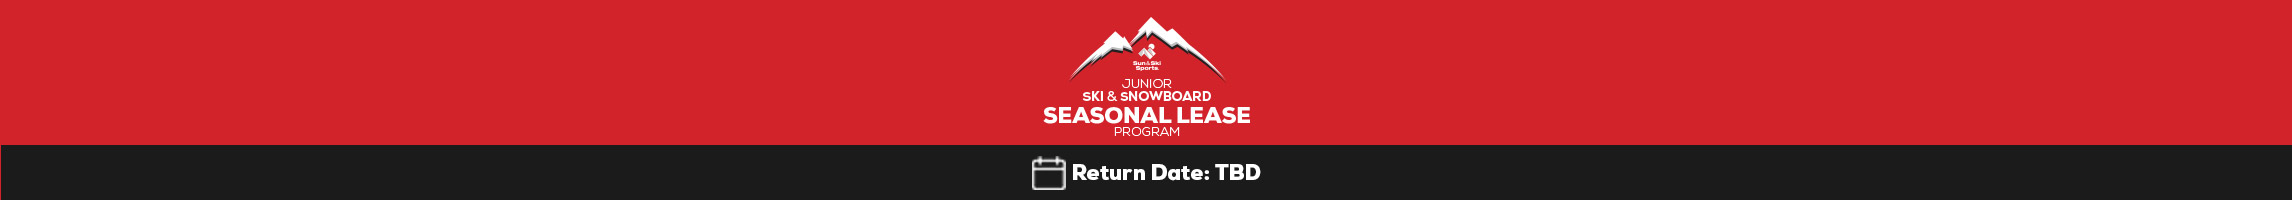 Junior Season Lease